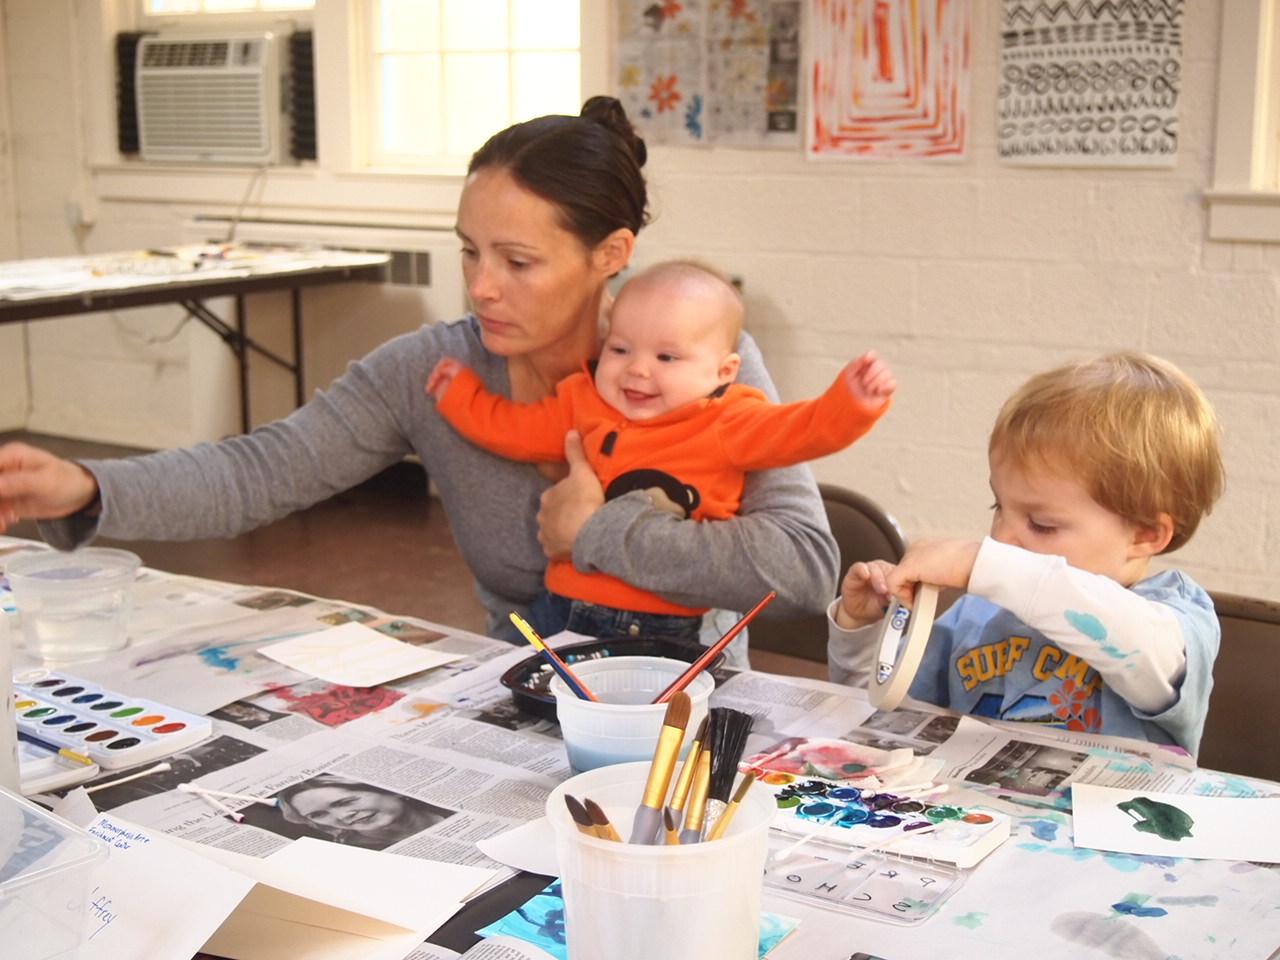 Everyone enjoying their creative time.